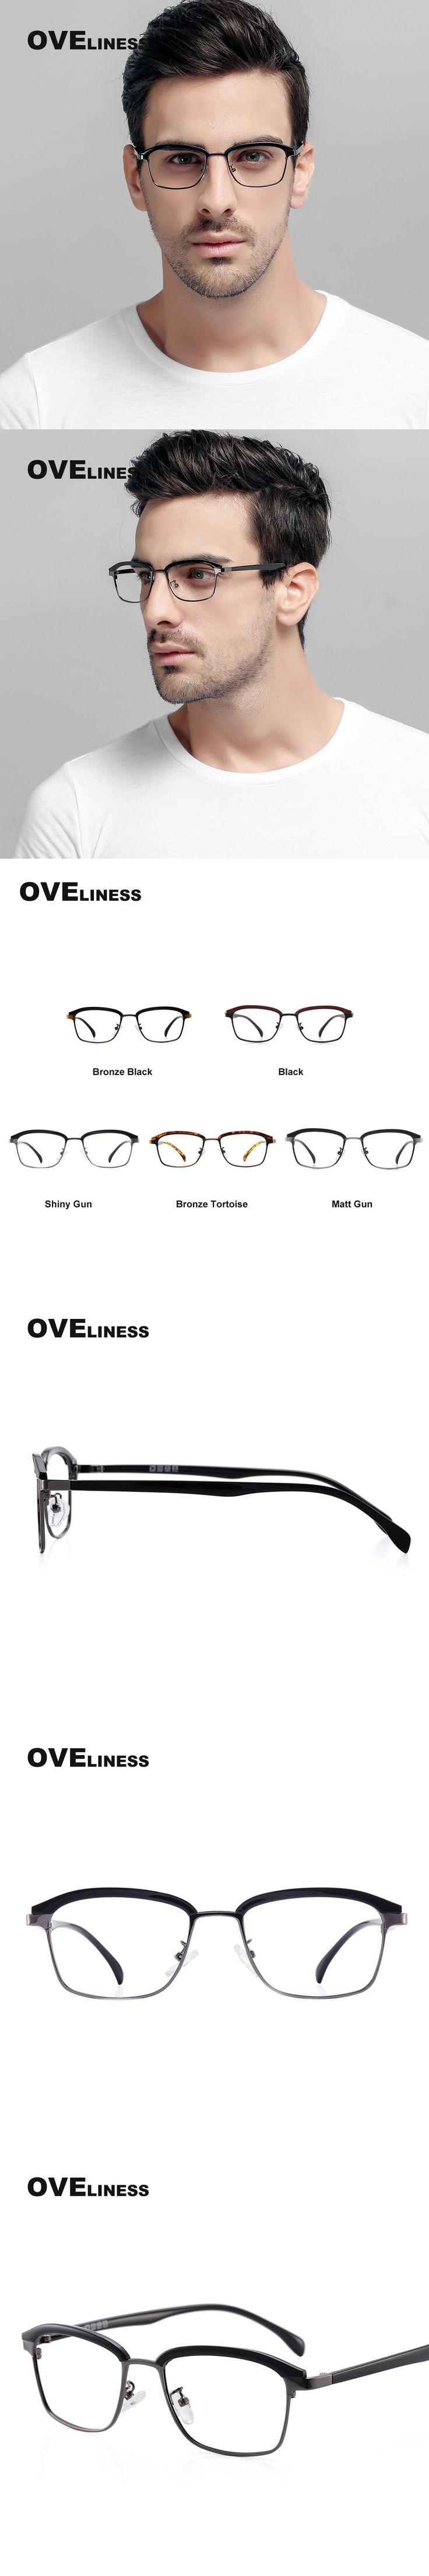 TR90 Eyeglasses Frames Man Optical Half Frames for Women Reading Glasses Clear Lens myopia Prescription spectacle frame eyewear